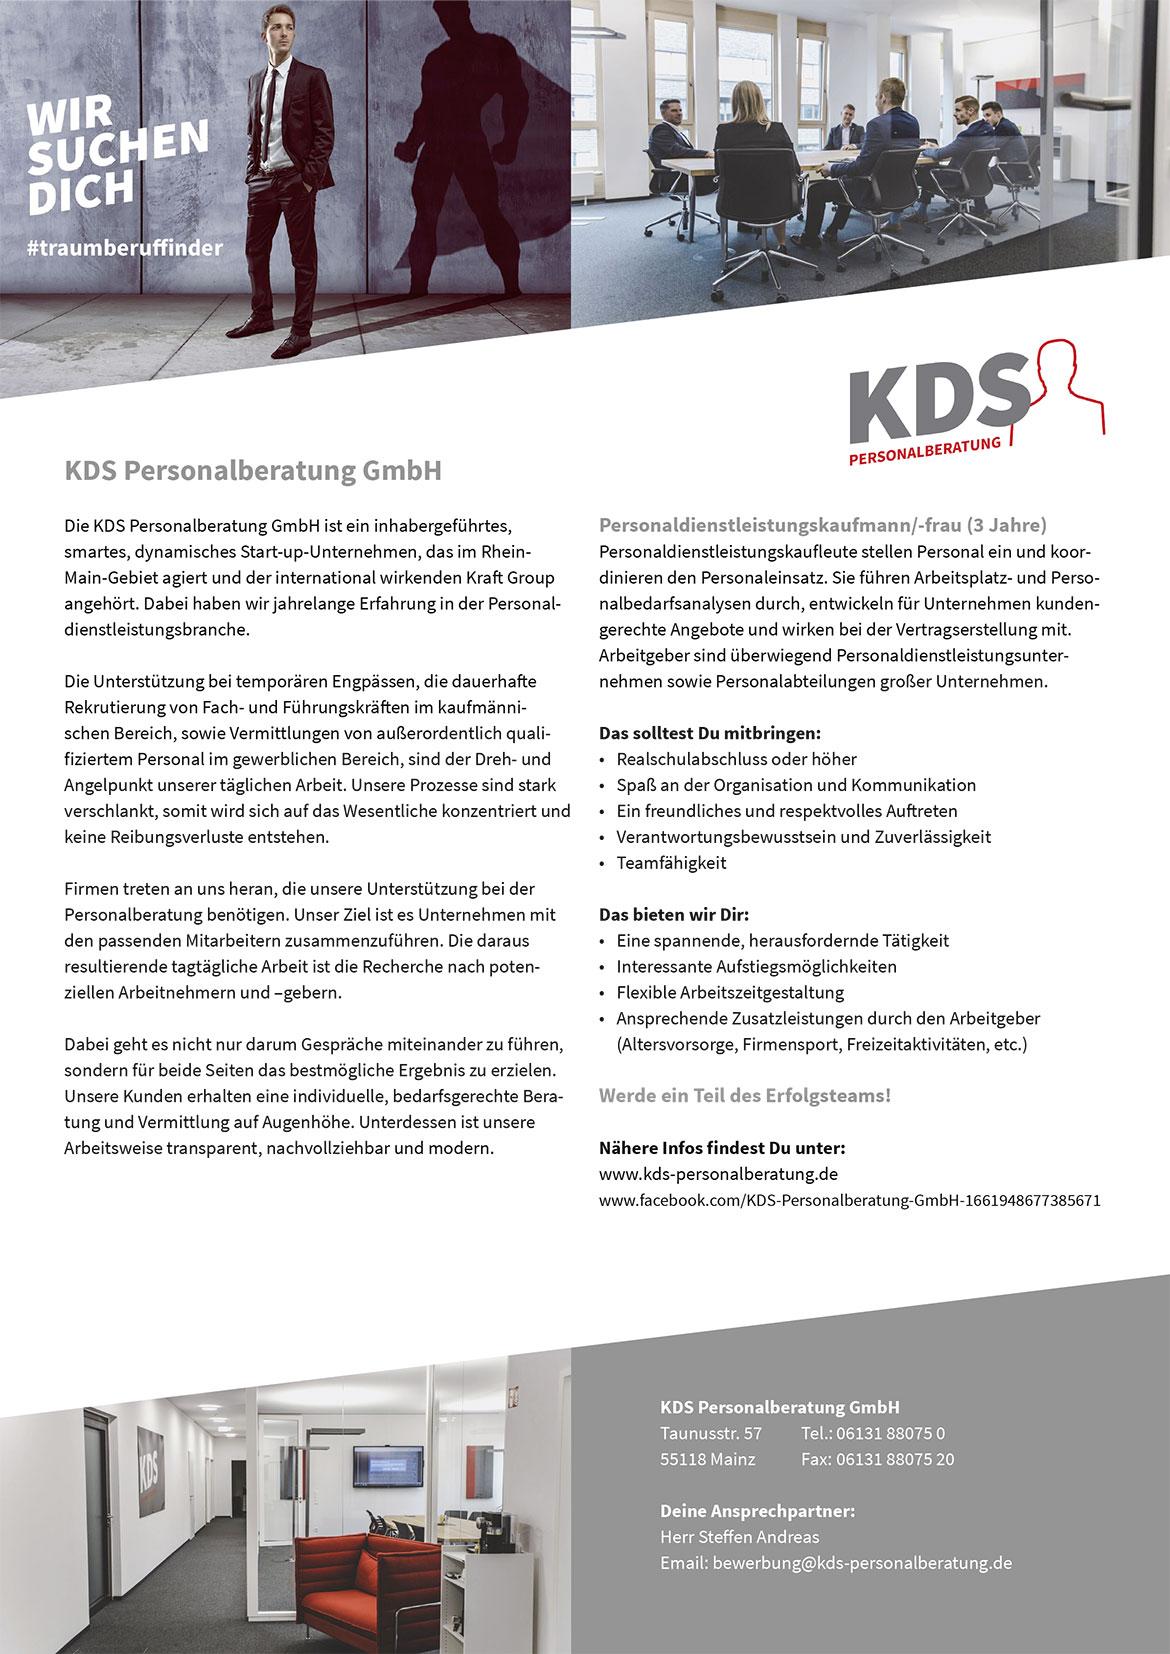 Ausbildungsplakat: KDS Personalberatung